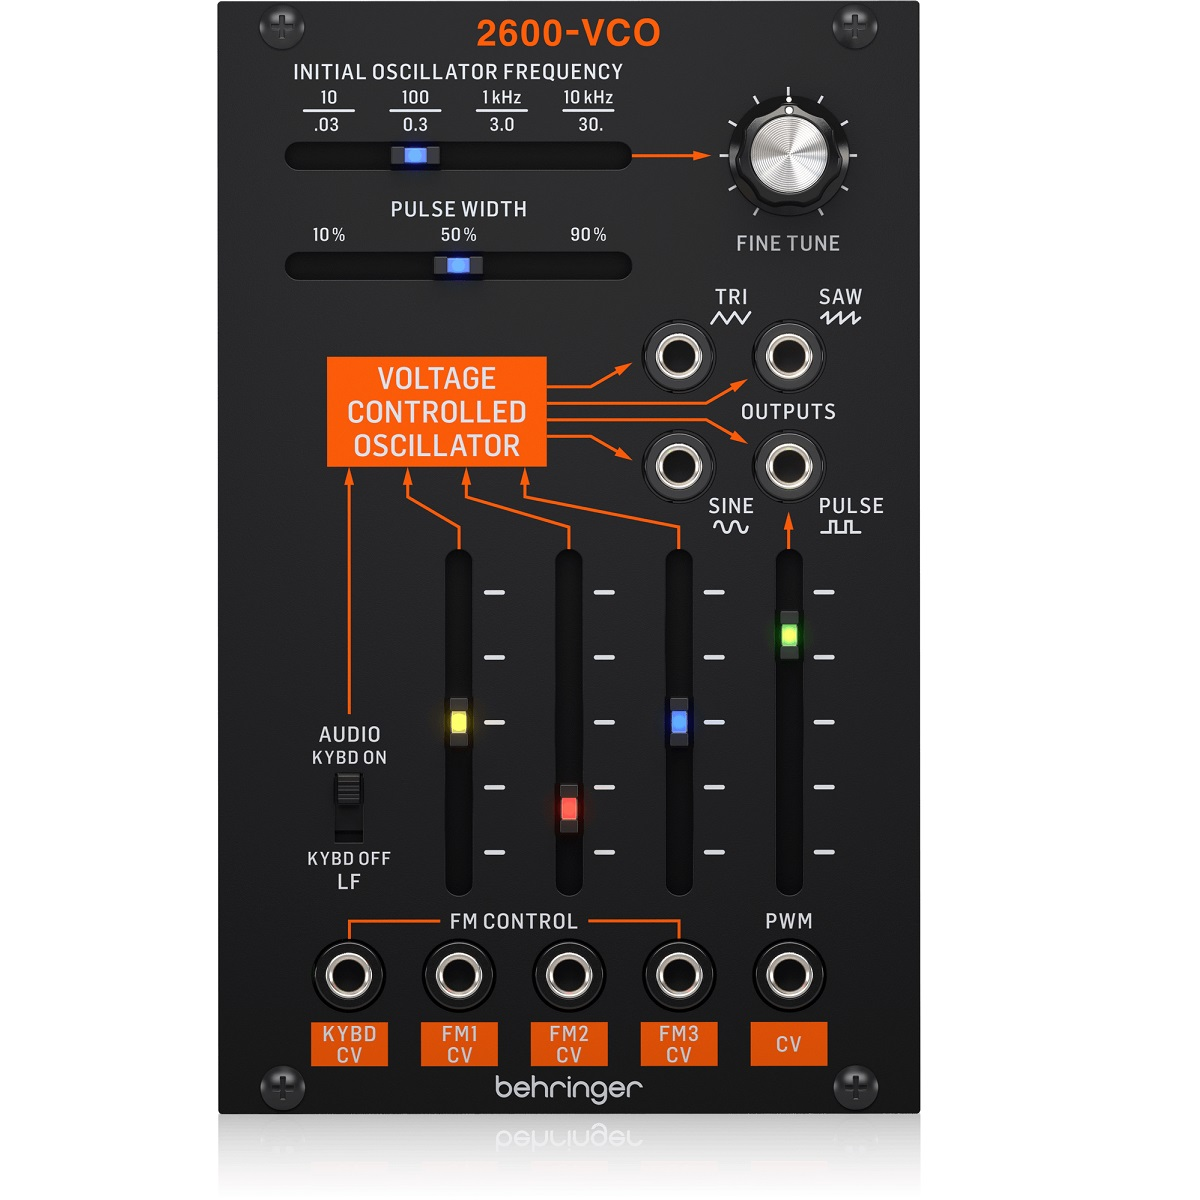 BEHRINGER 2600-VCO ANALOGICO MODULO EURORACK 1